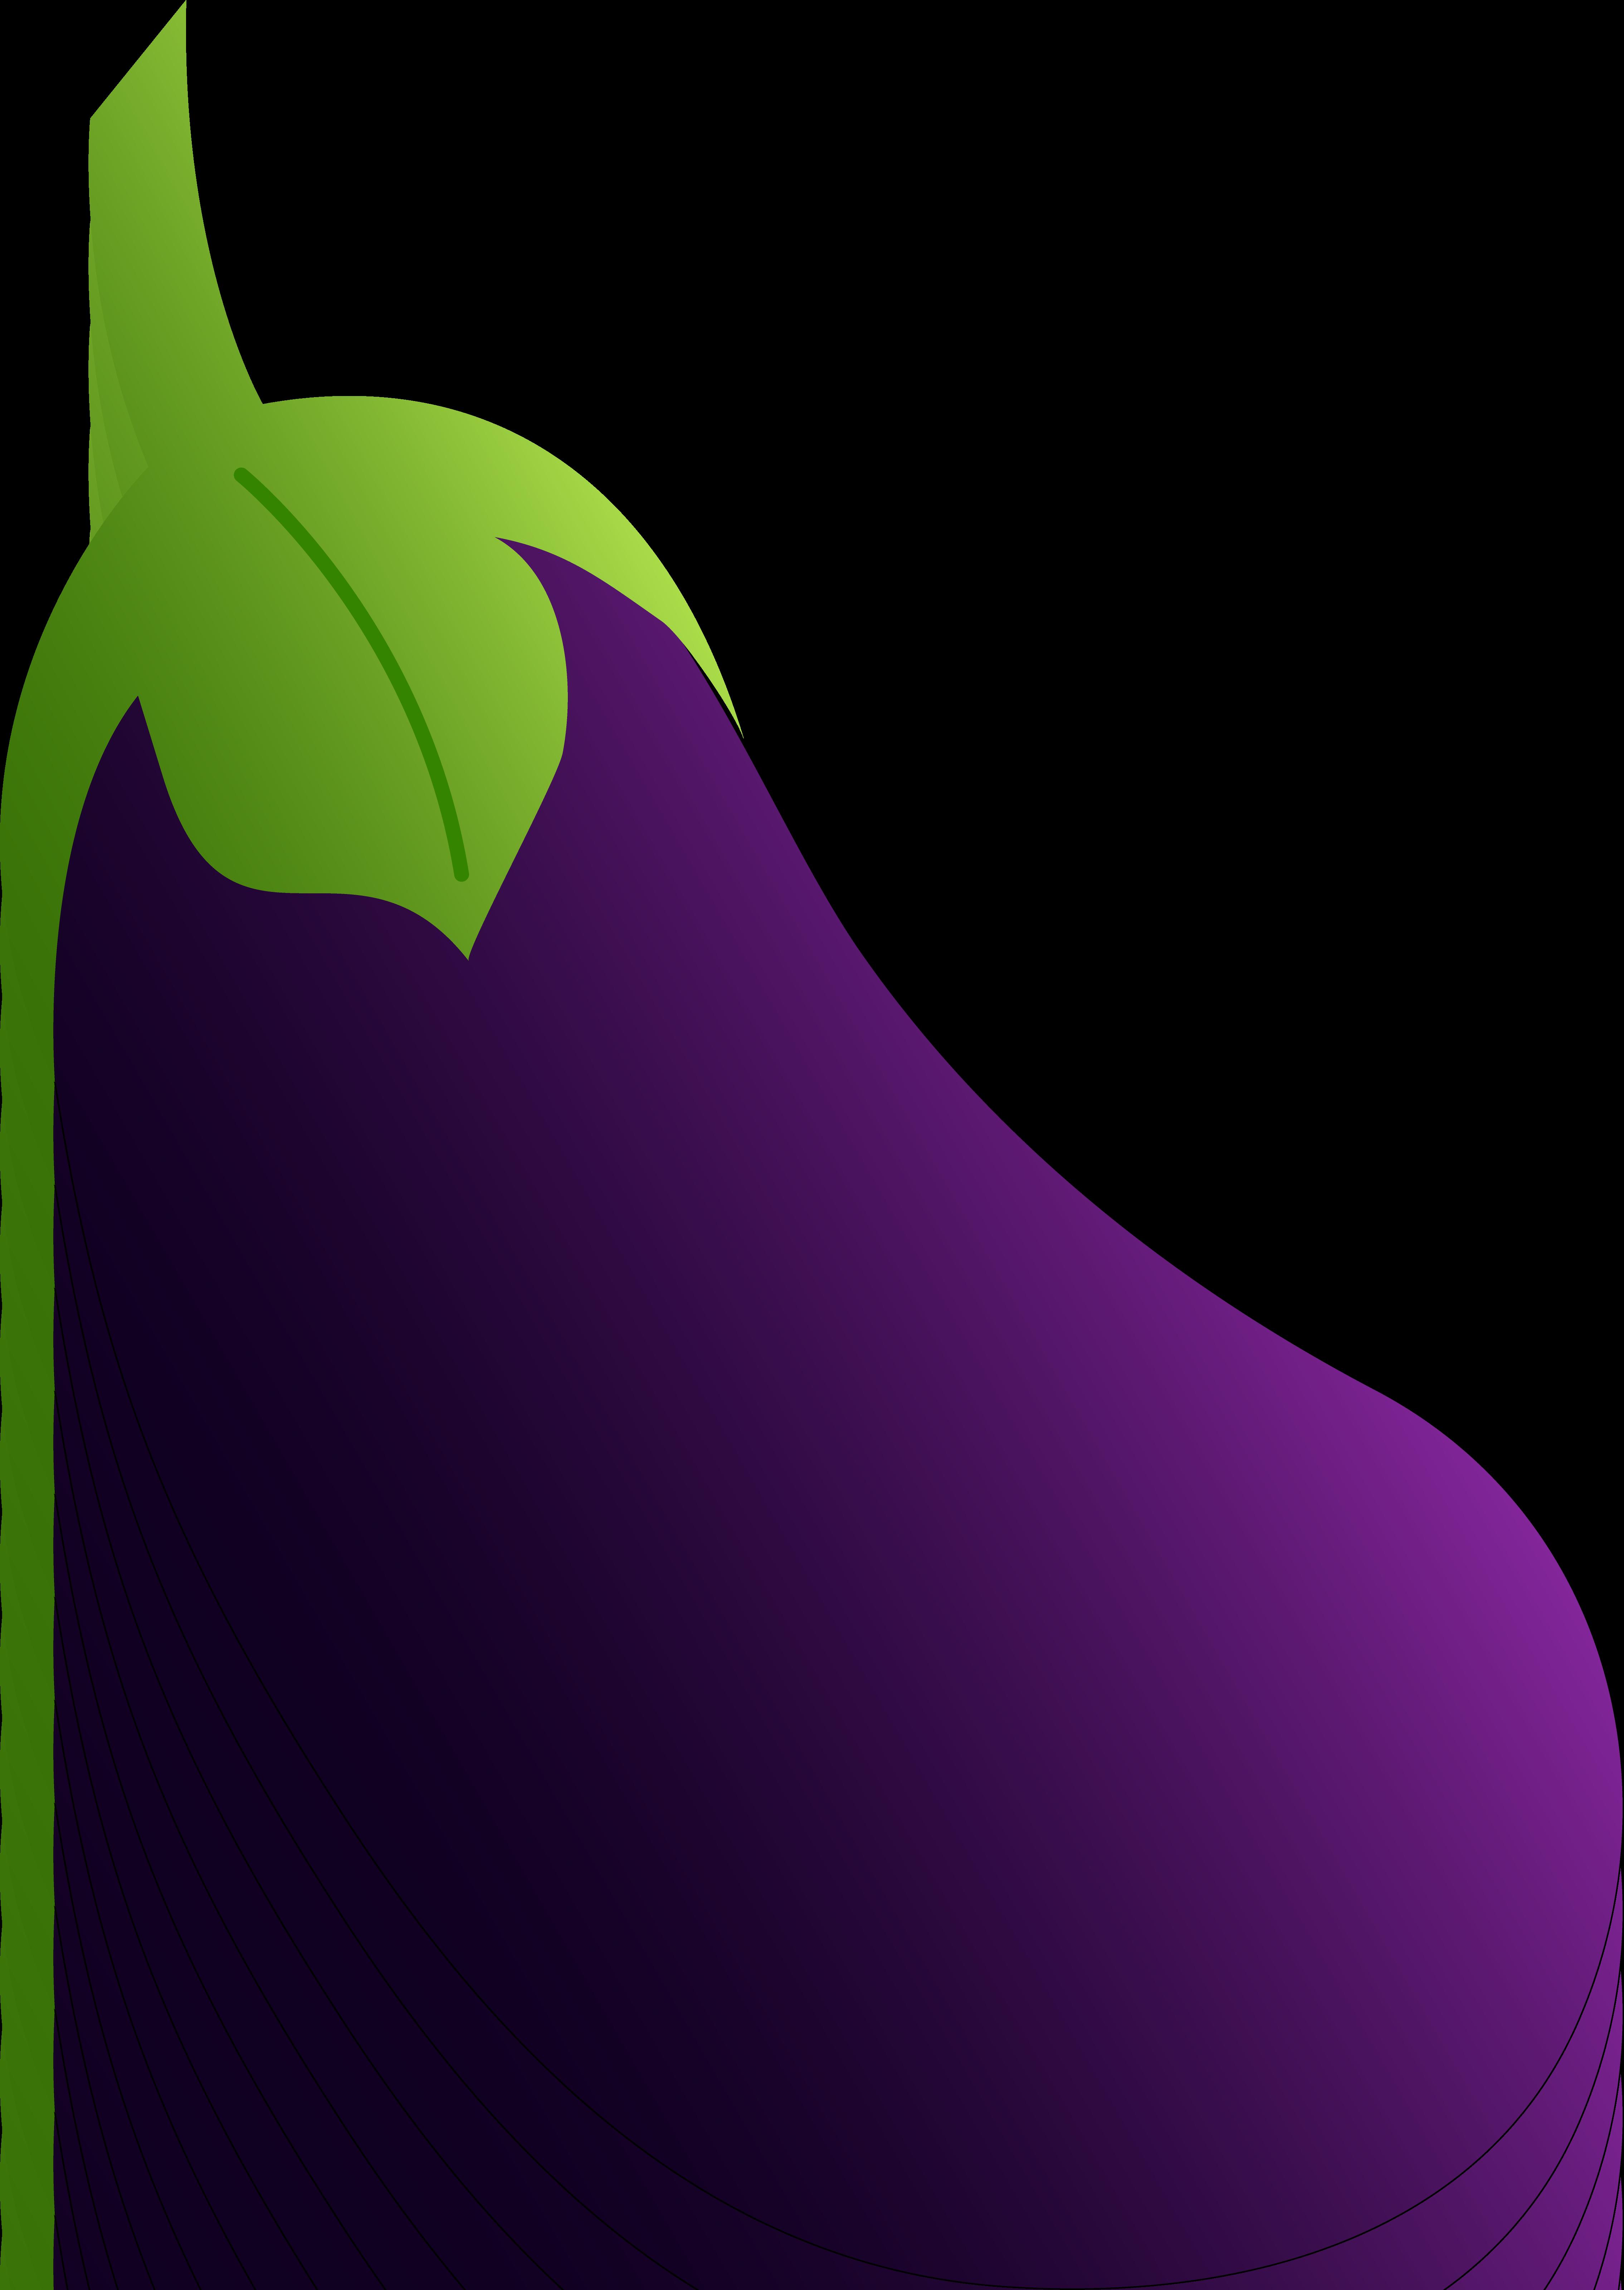 Clipart aubergine colour.